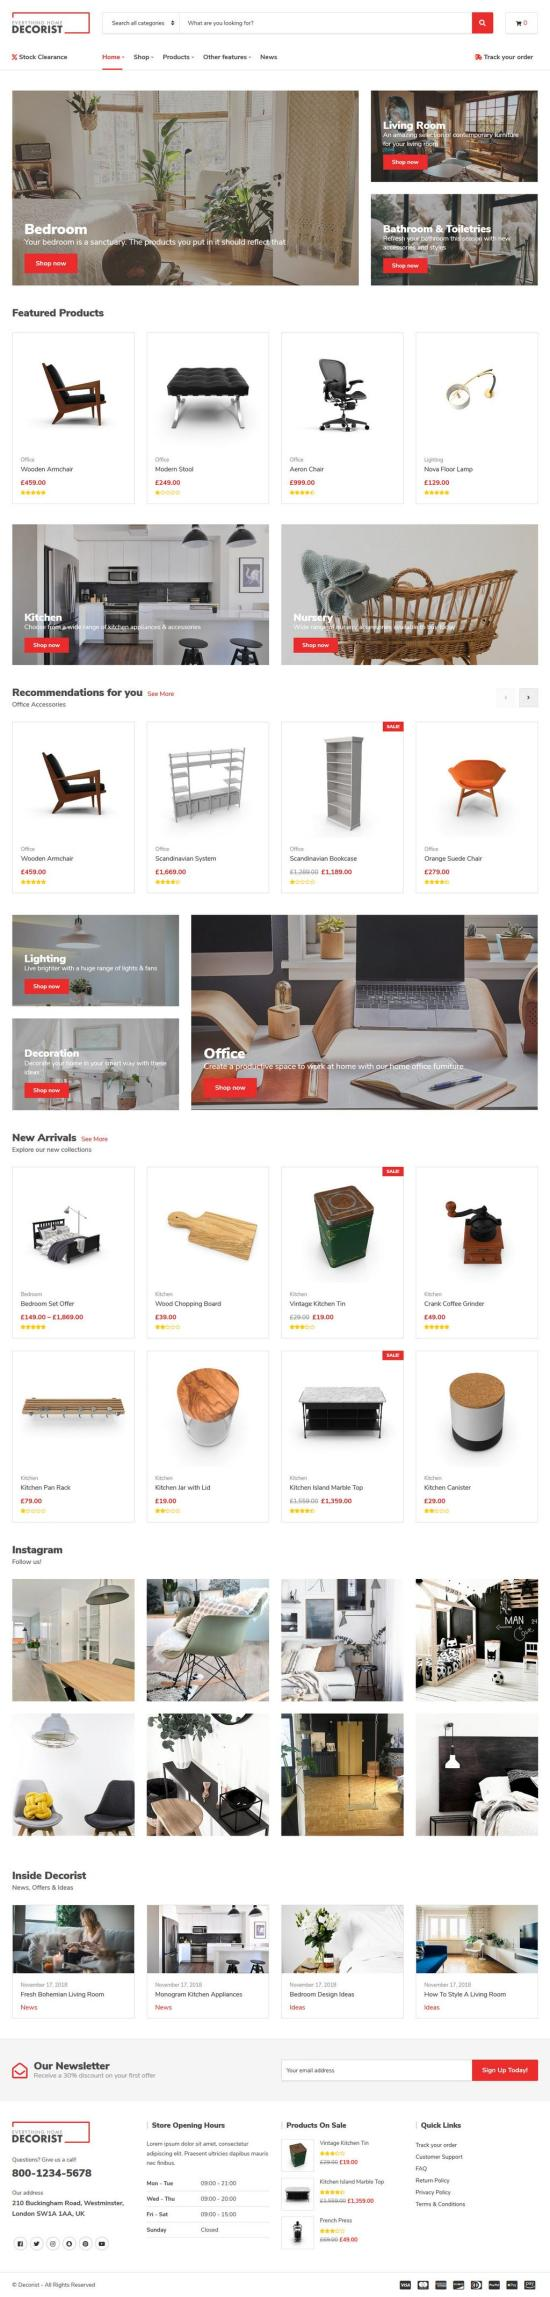 decorist wordpress theme 01 - Decorist WordPress Theme